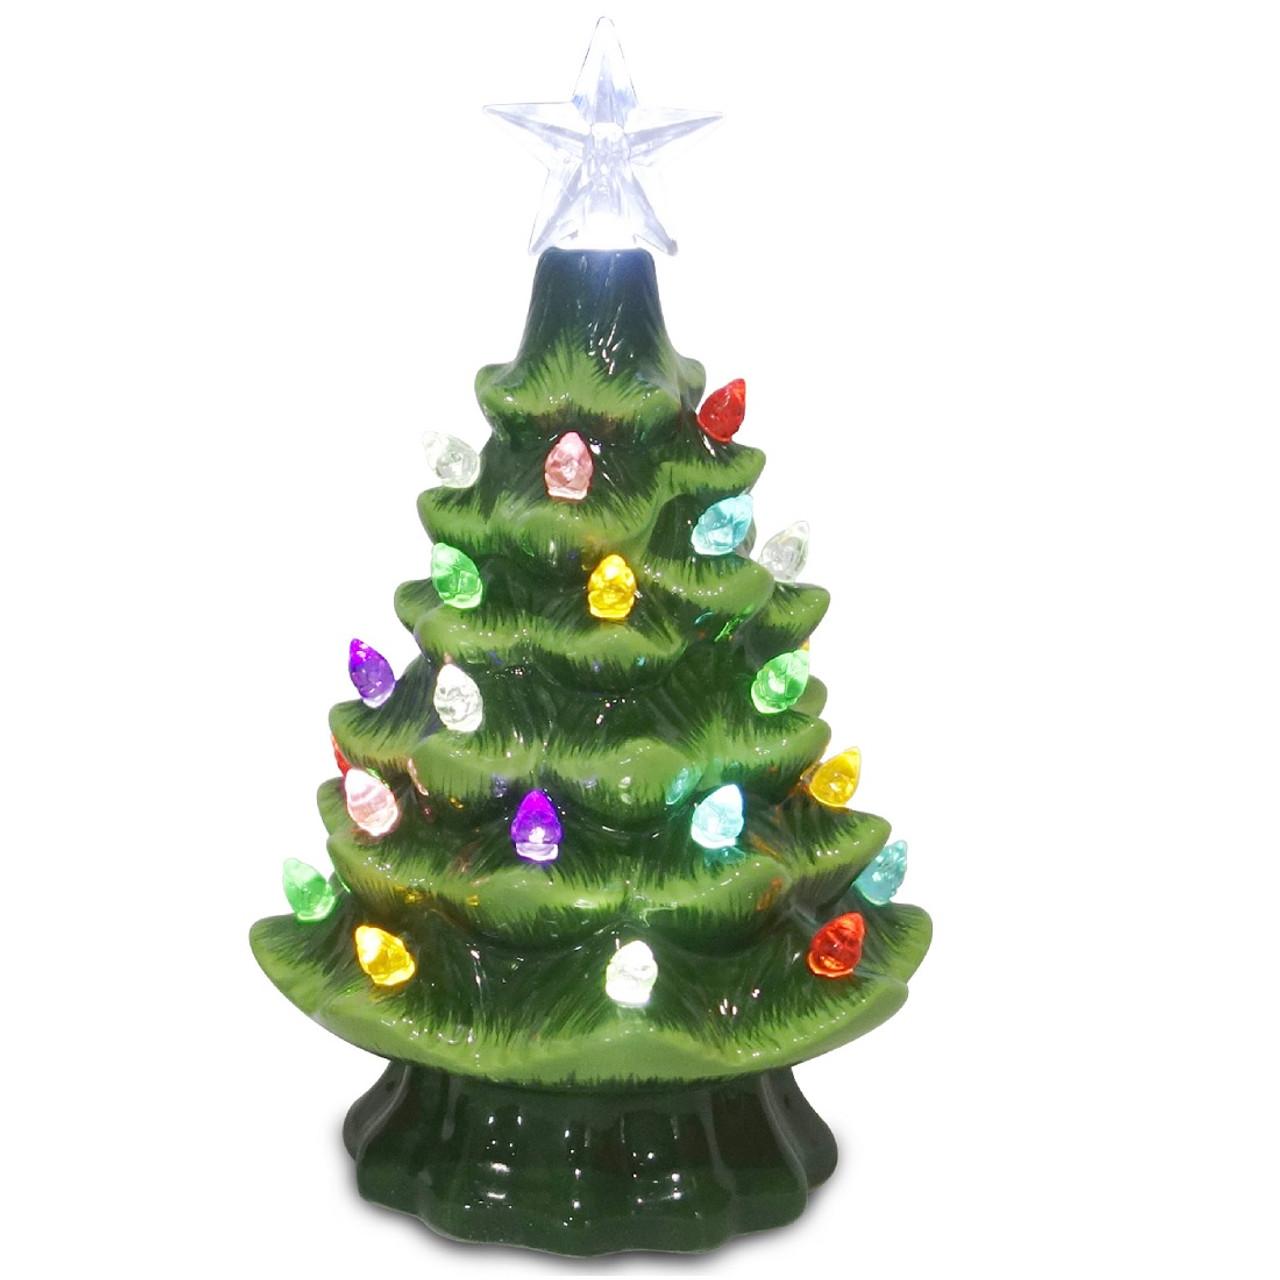 5 5 Green Ceramic Christmas Tree With 32 Bulbs